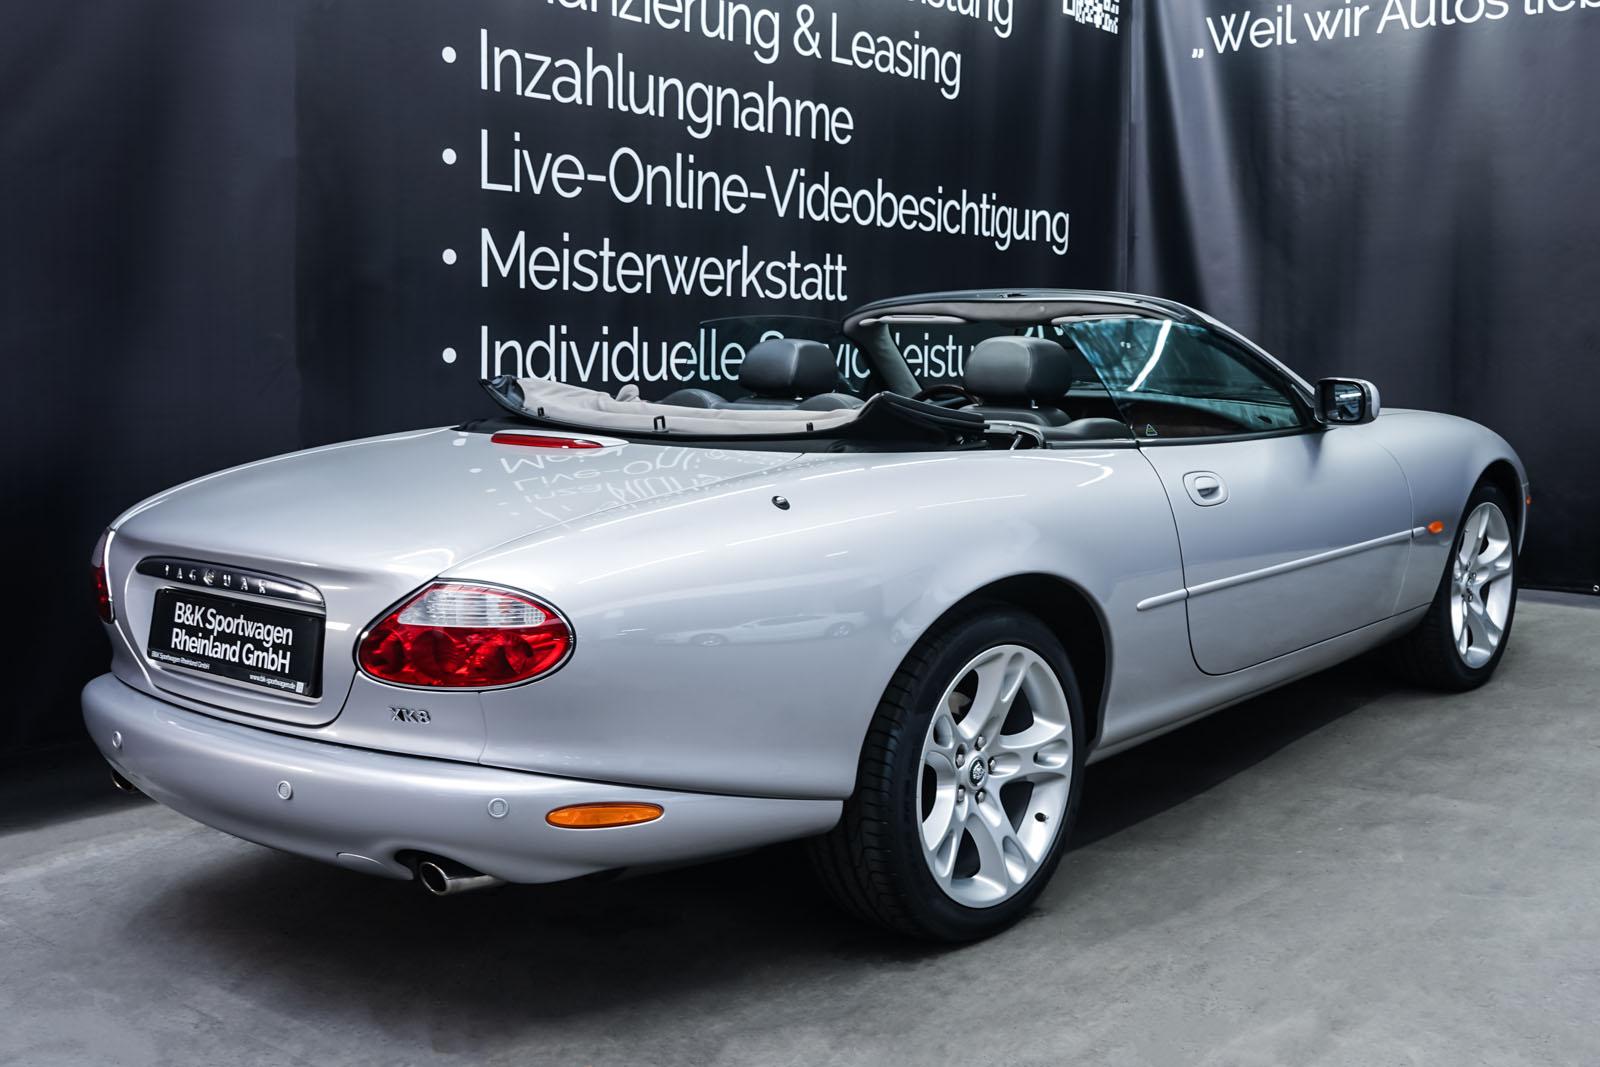 Jaguar_XK8_4.0_Silber_Schwarz_JAG-9731_18_w